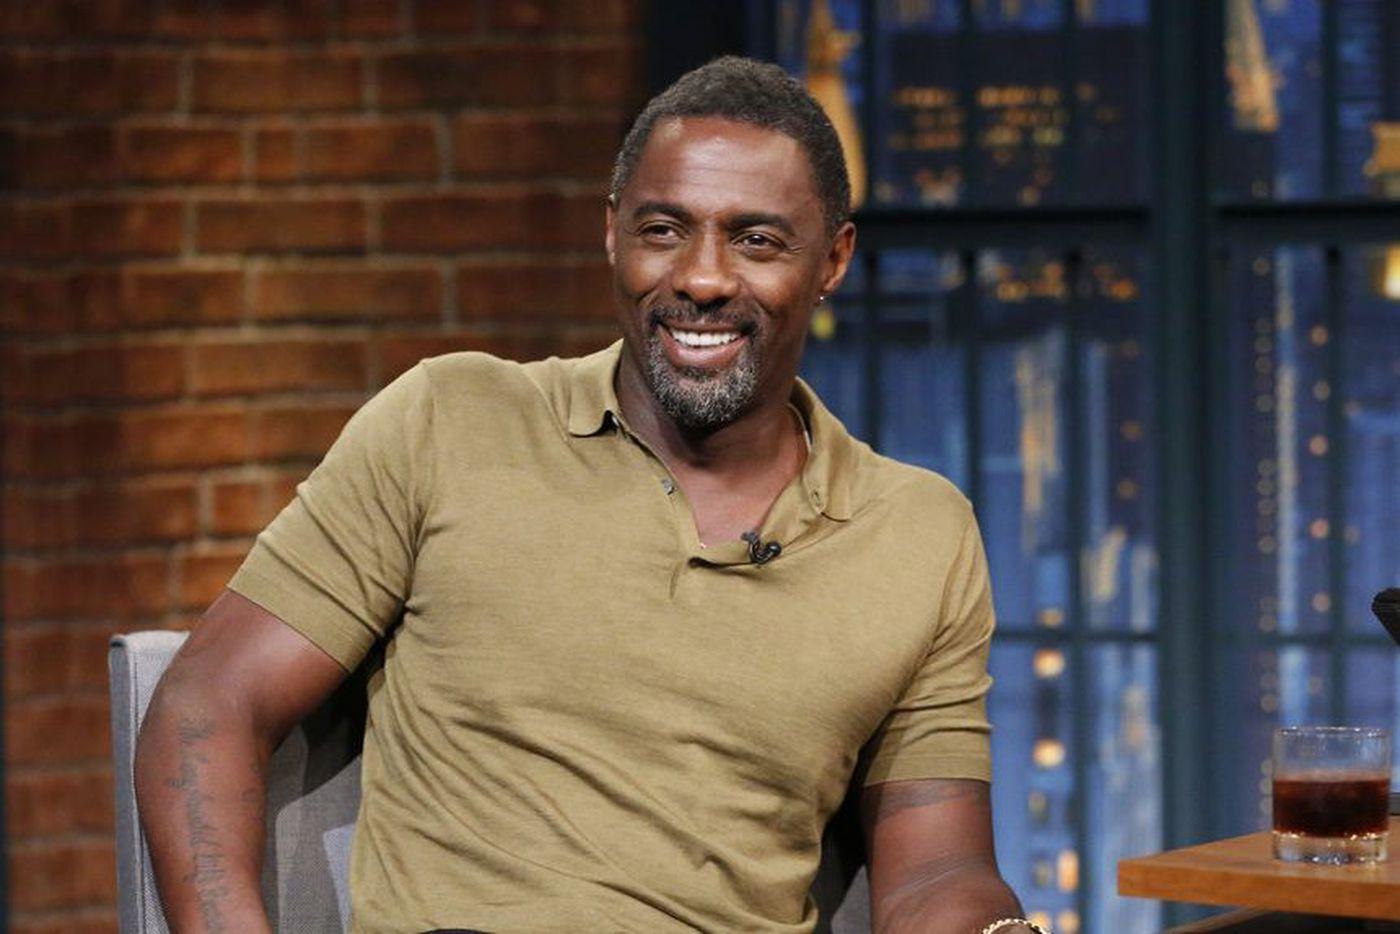 Idris Elba set to star in North Philly urban horseback riding drama 'Ghetto Cowboy'